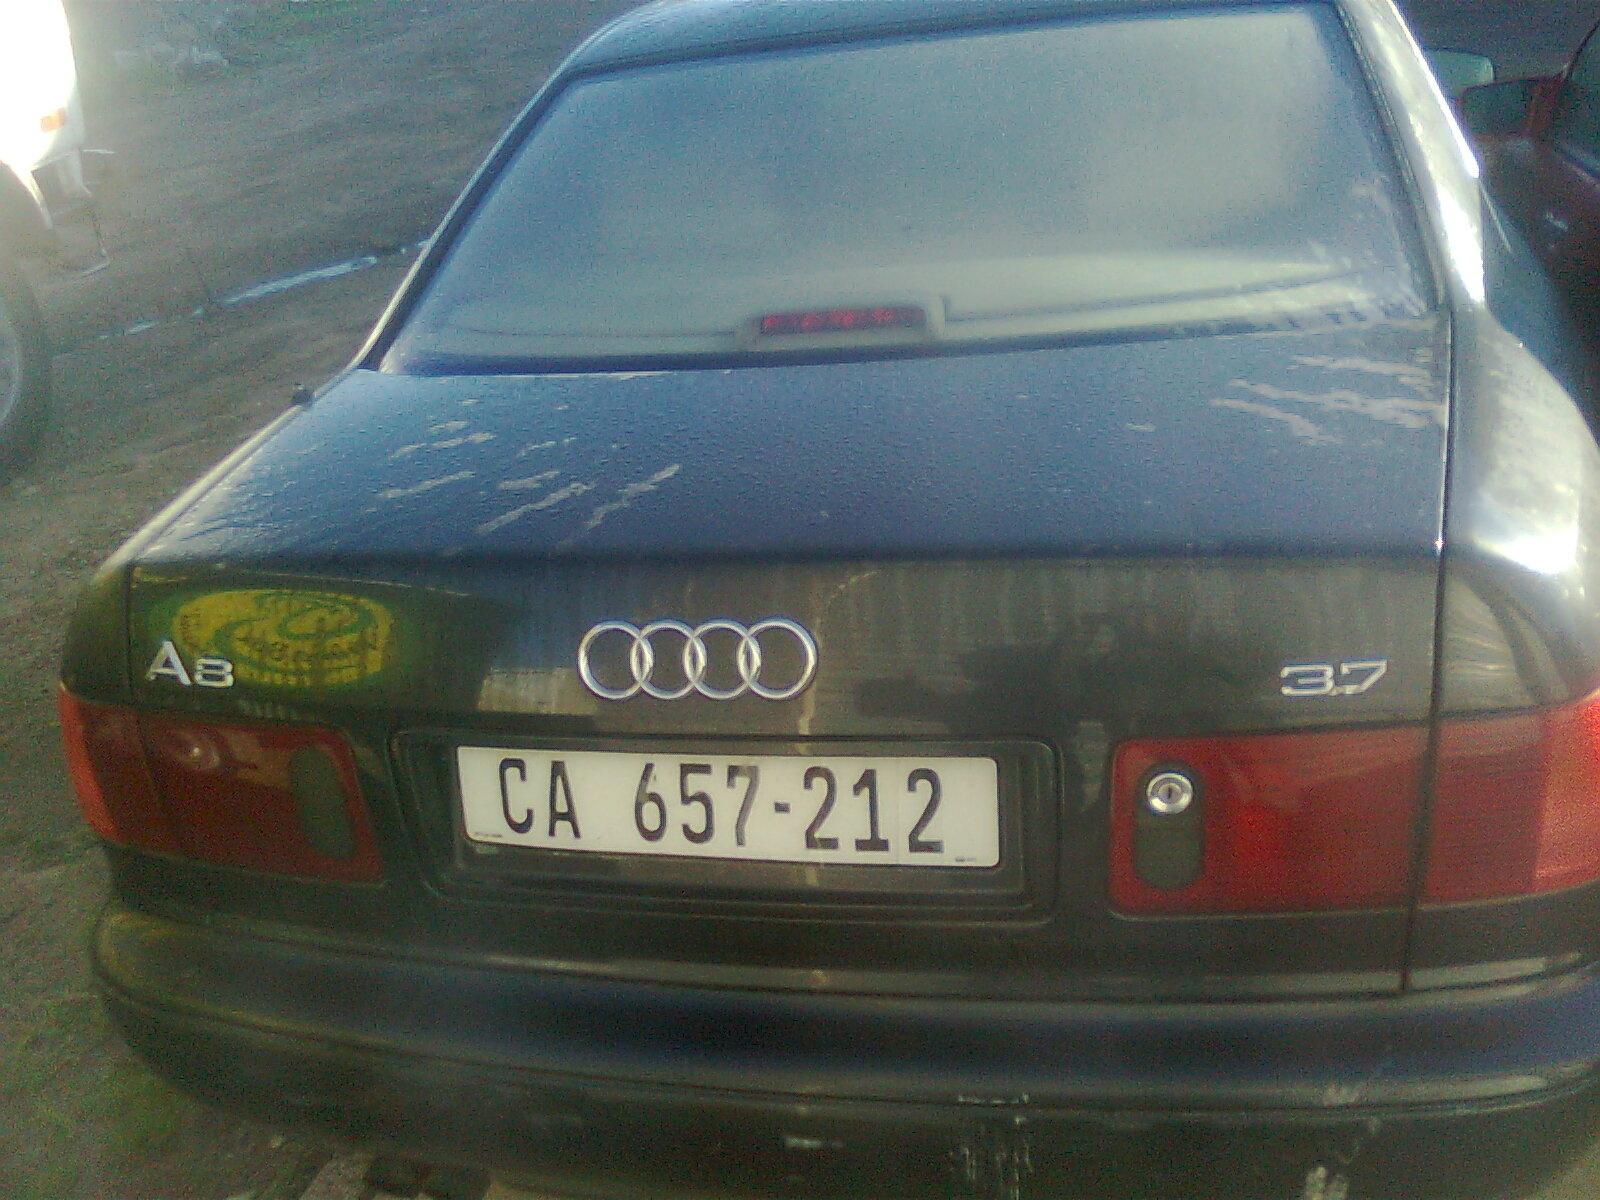 1999 Audi A8 - Overview - CarGurus